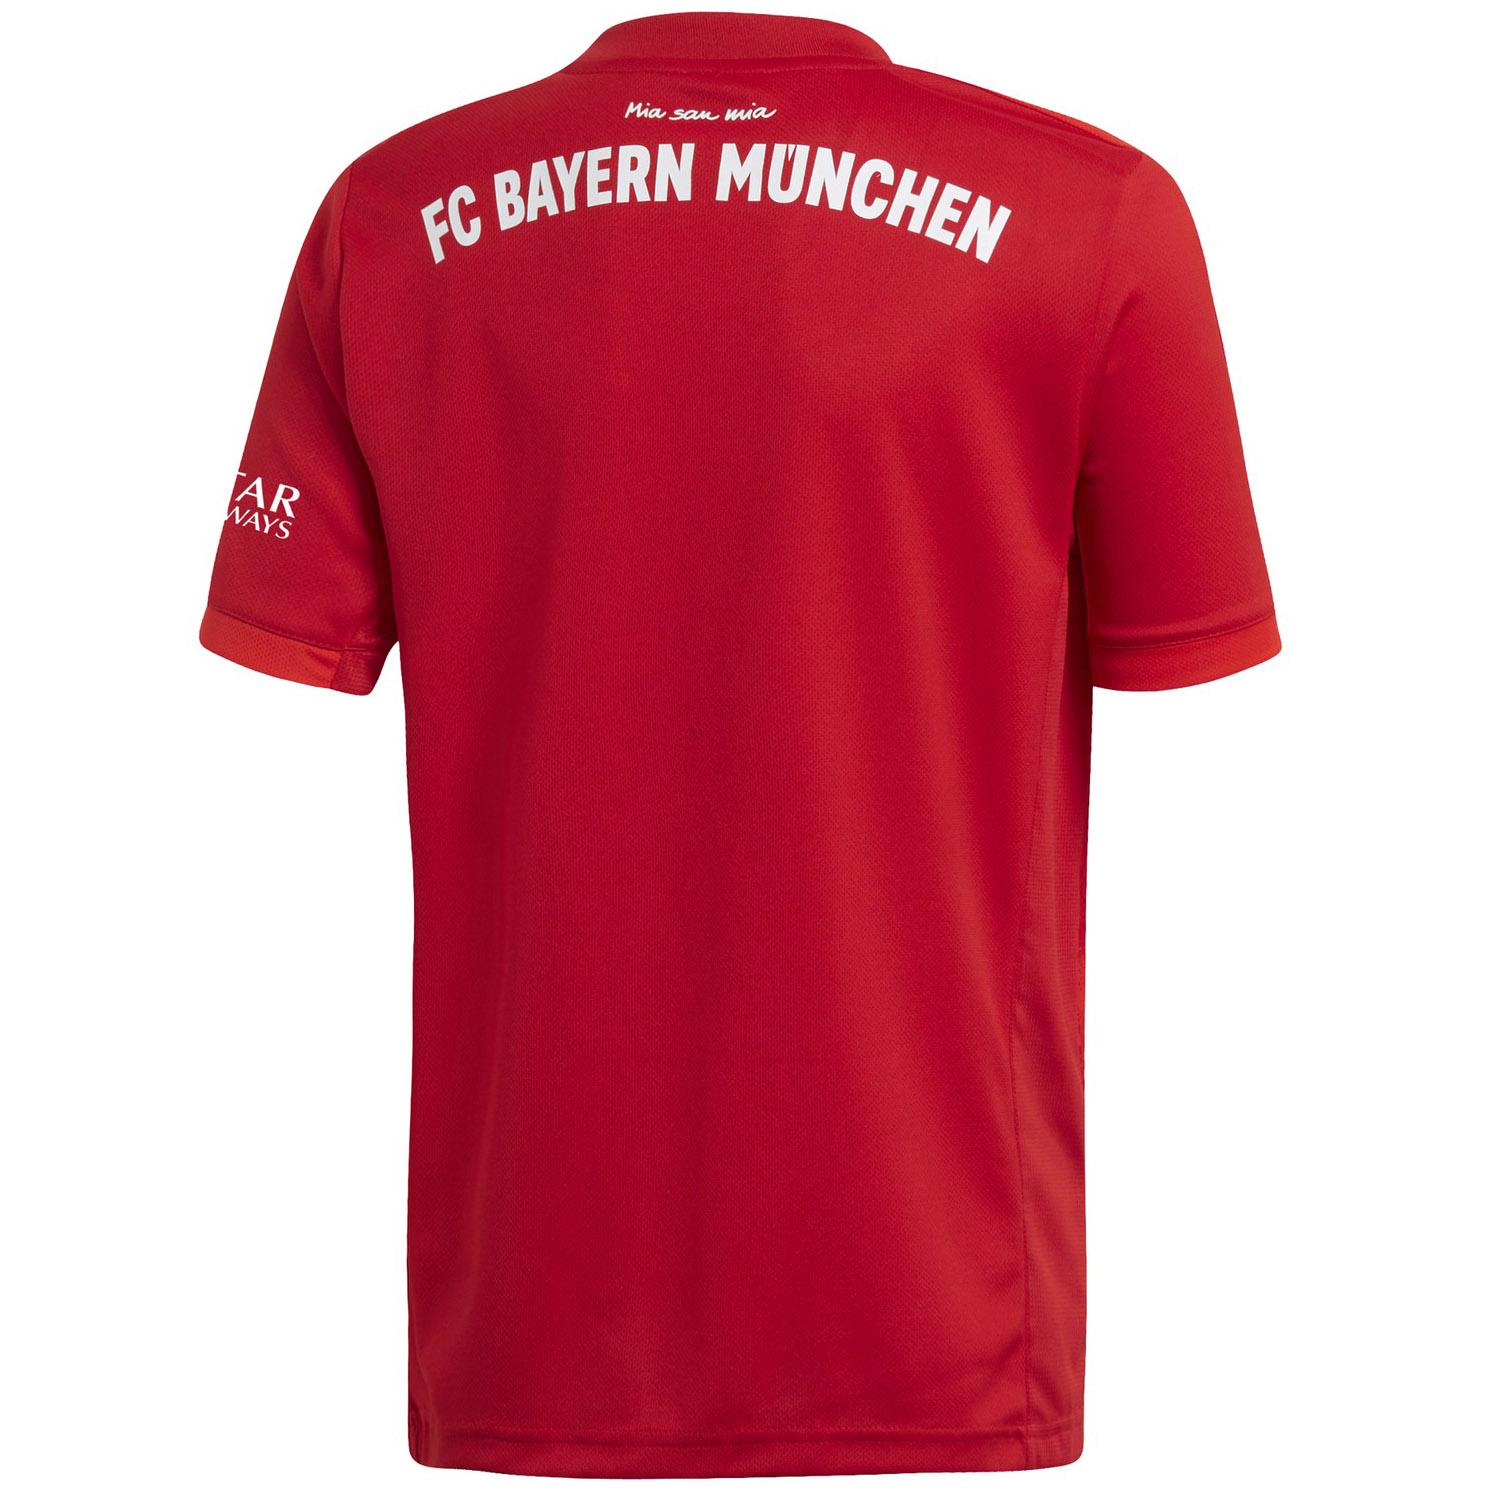 adidas-FC-Bayern-Muenchen-Heimtrikot-Kinder-2019-2020-Home-Jersey-rot-DX9253 Indexbild 21